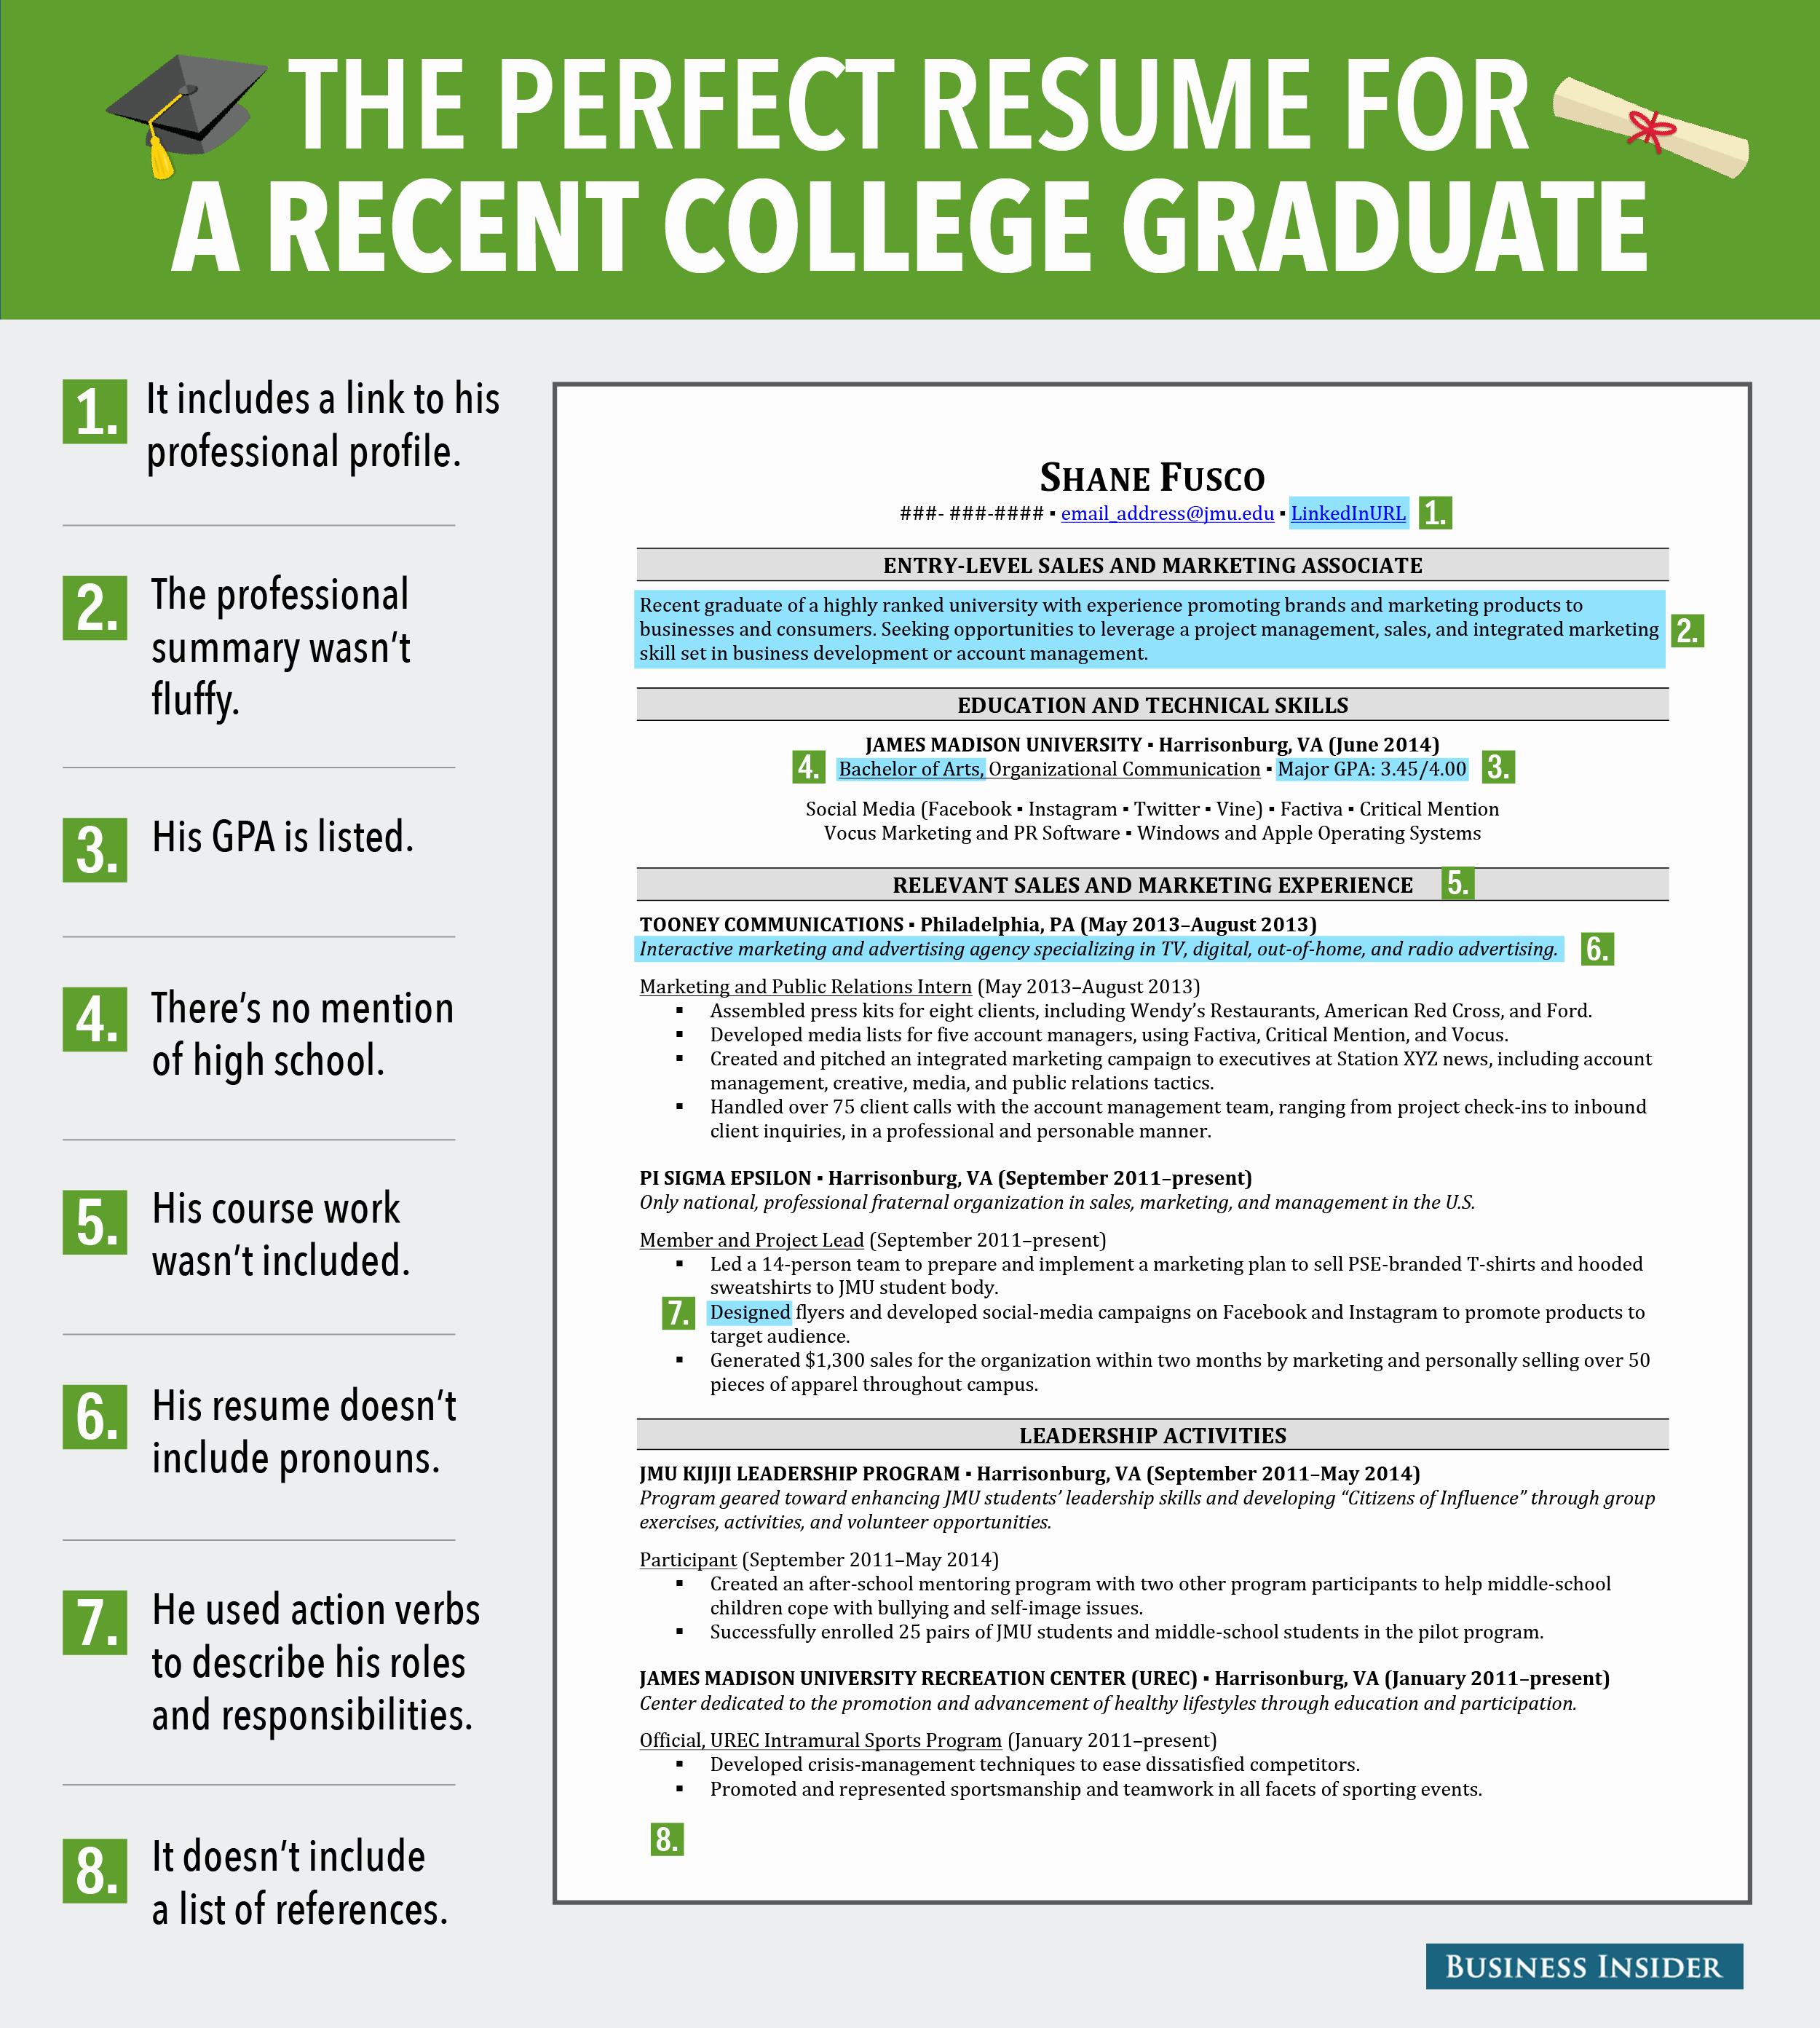 Resume for Recent College Grad Beautiful Excellent Resume for Recent Grad Business Insider